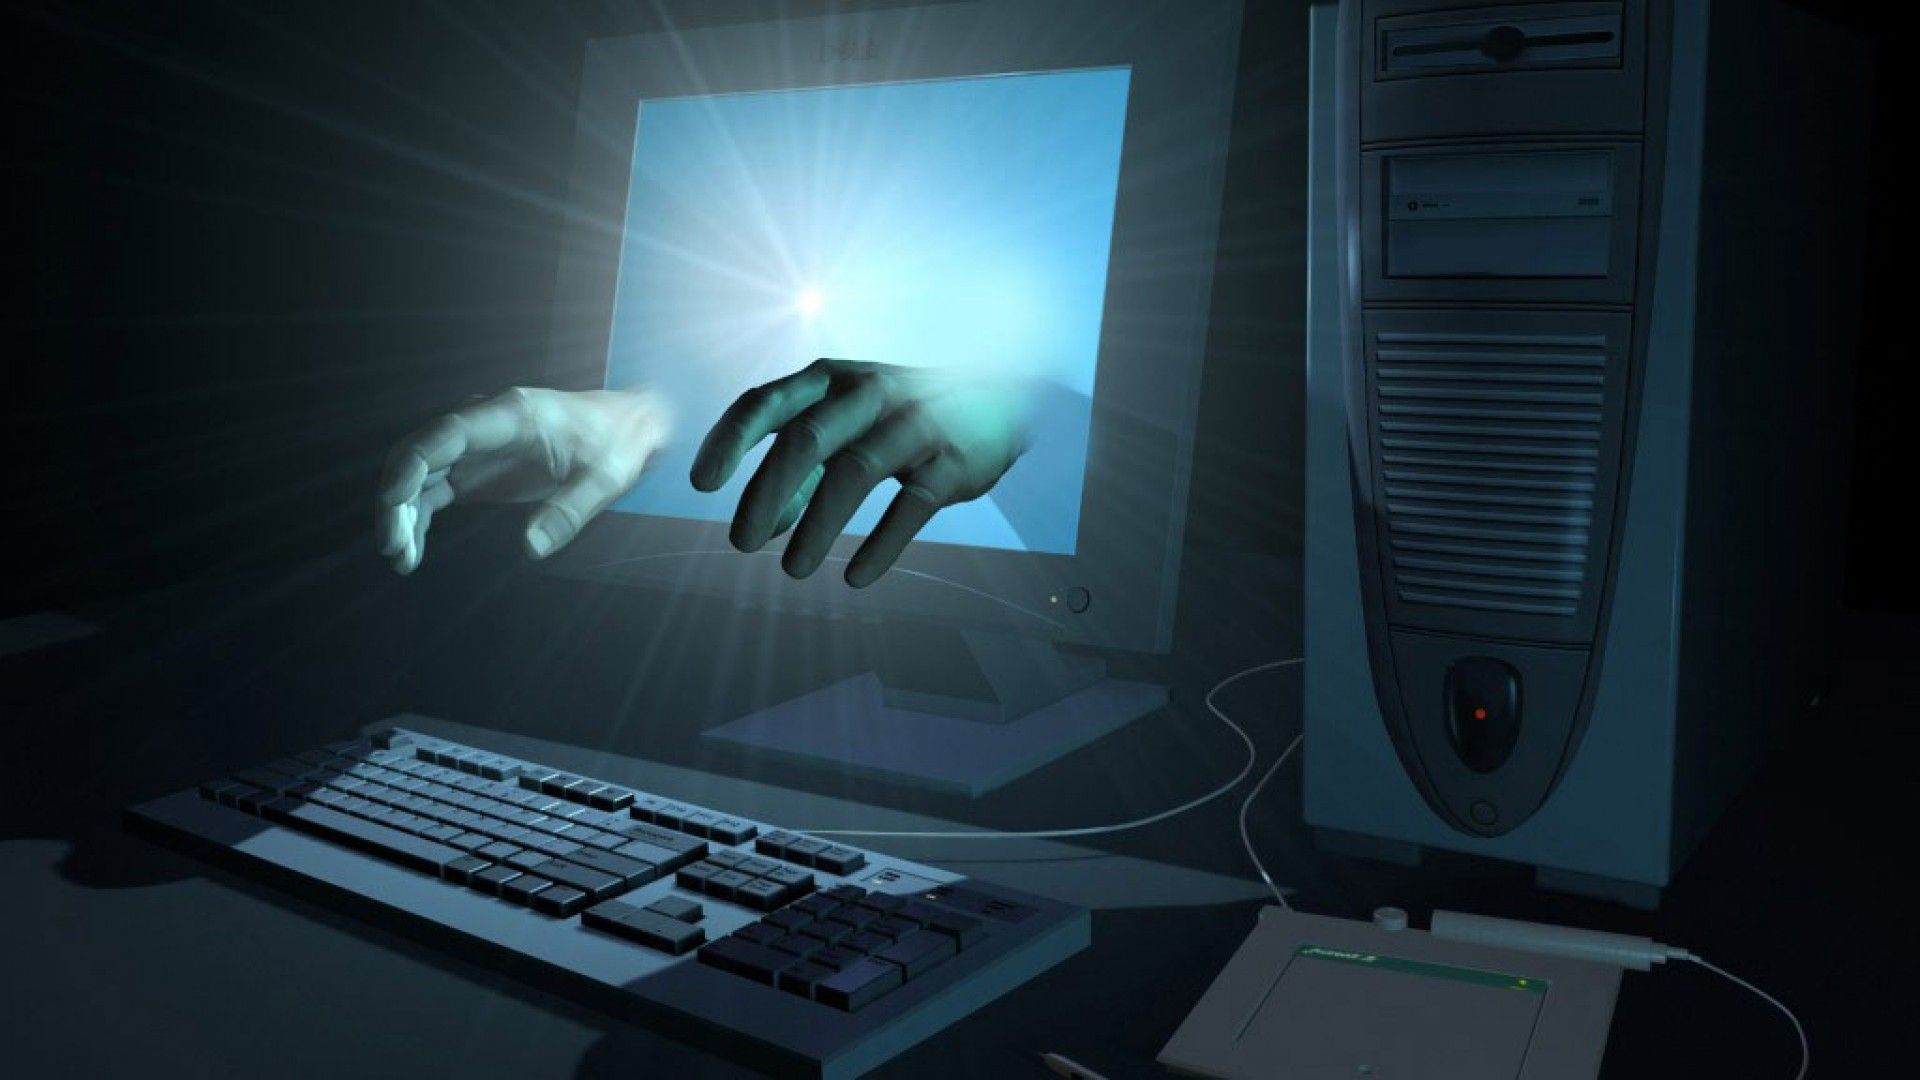 computer wallpaper desktop background hd free download